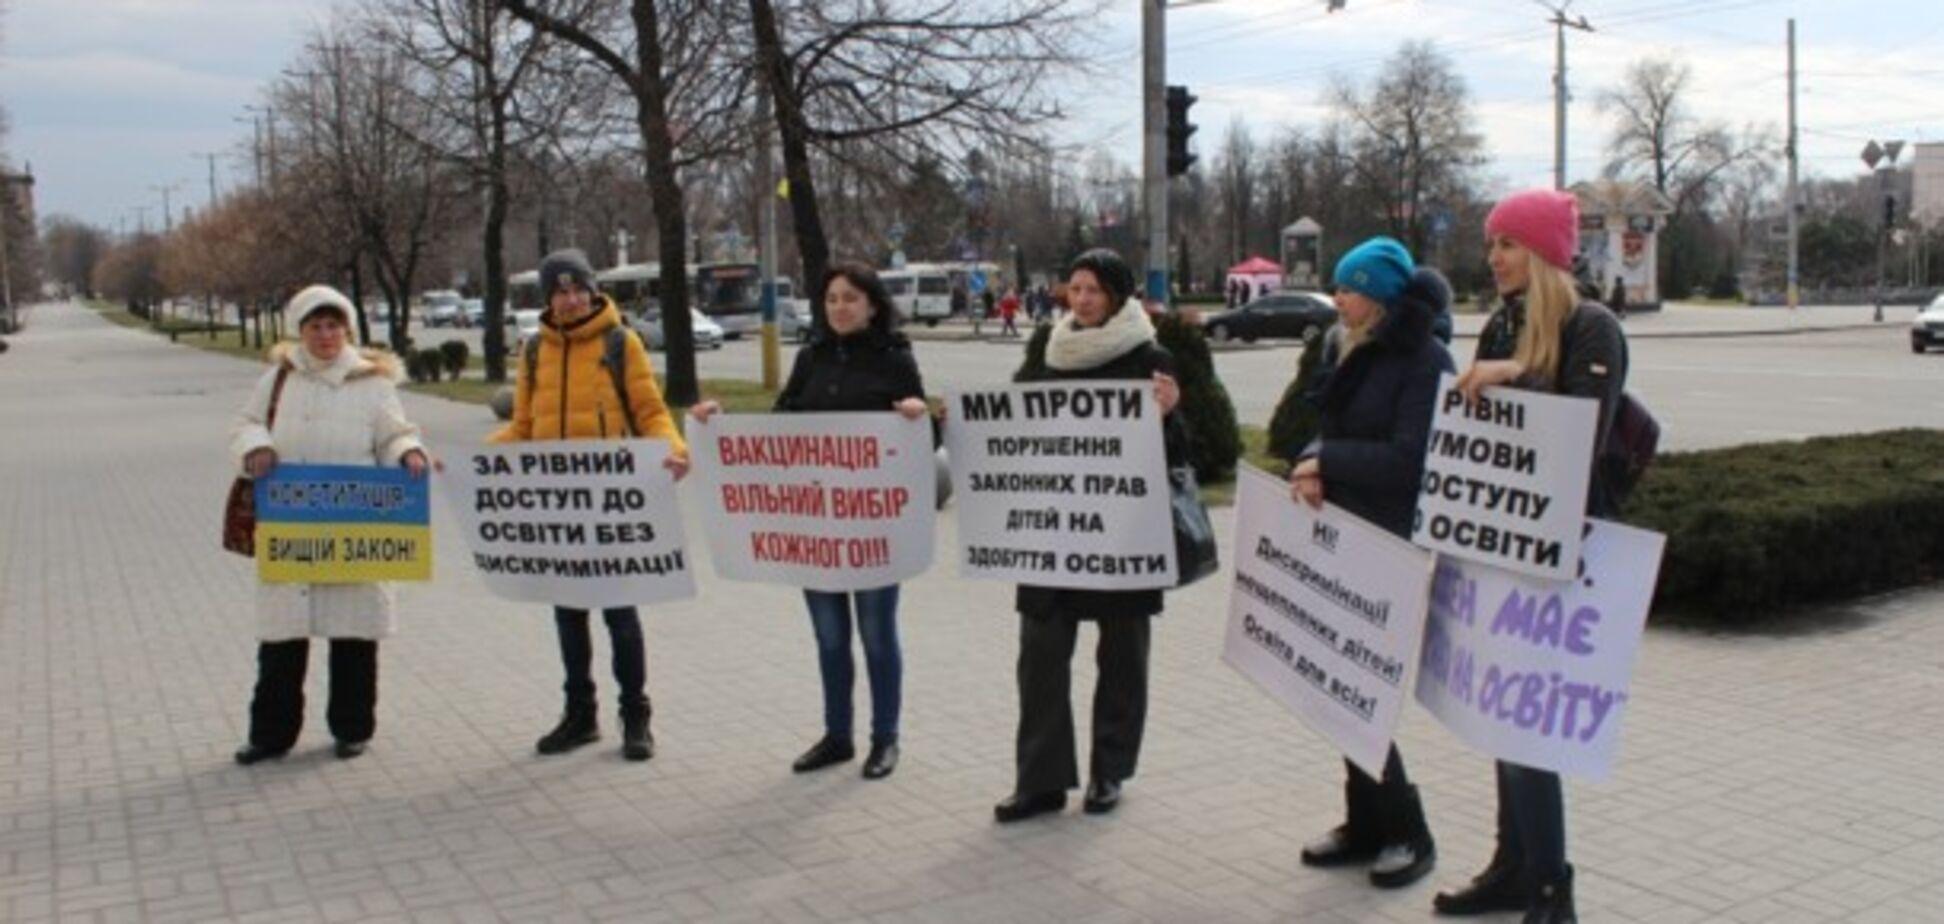 Запорожские родители провели митинг против вакцинации детей